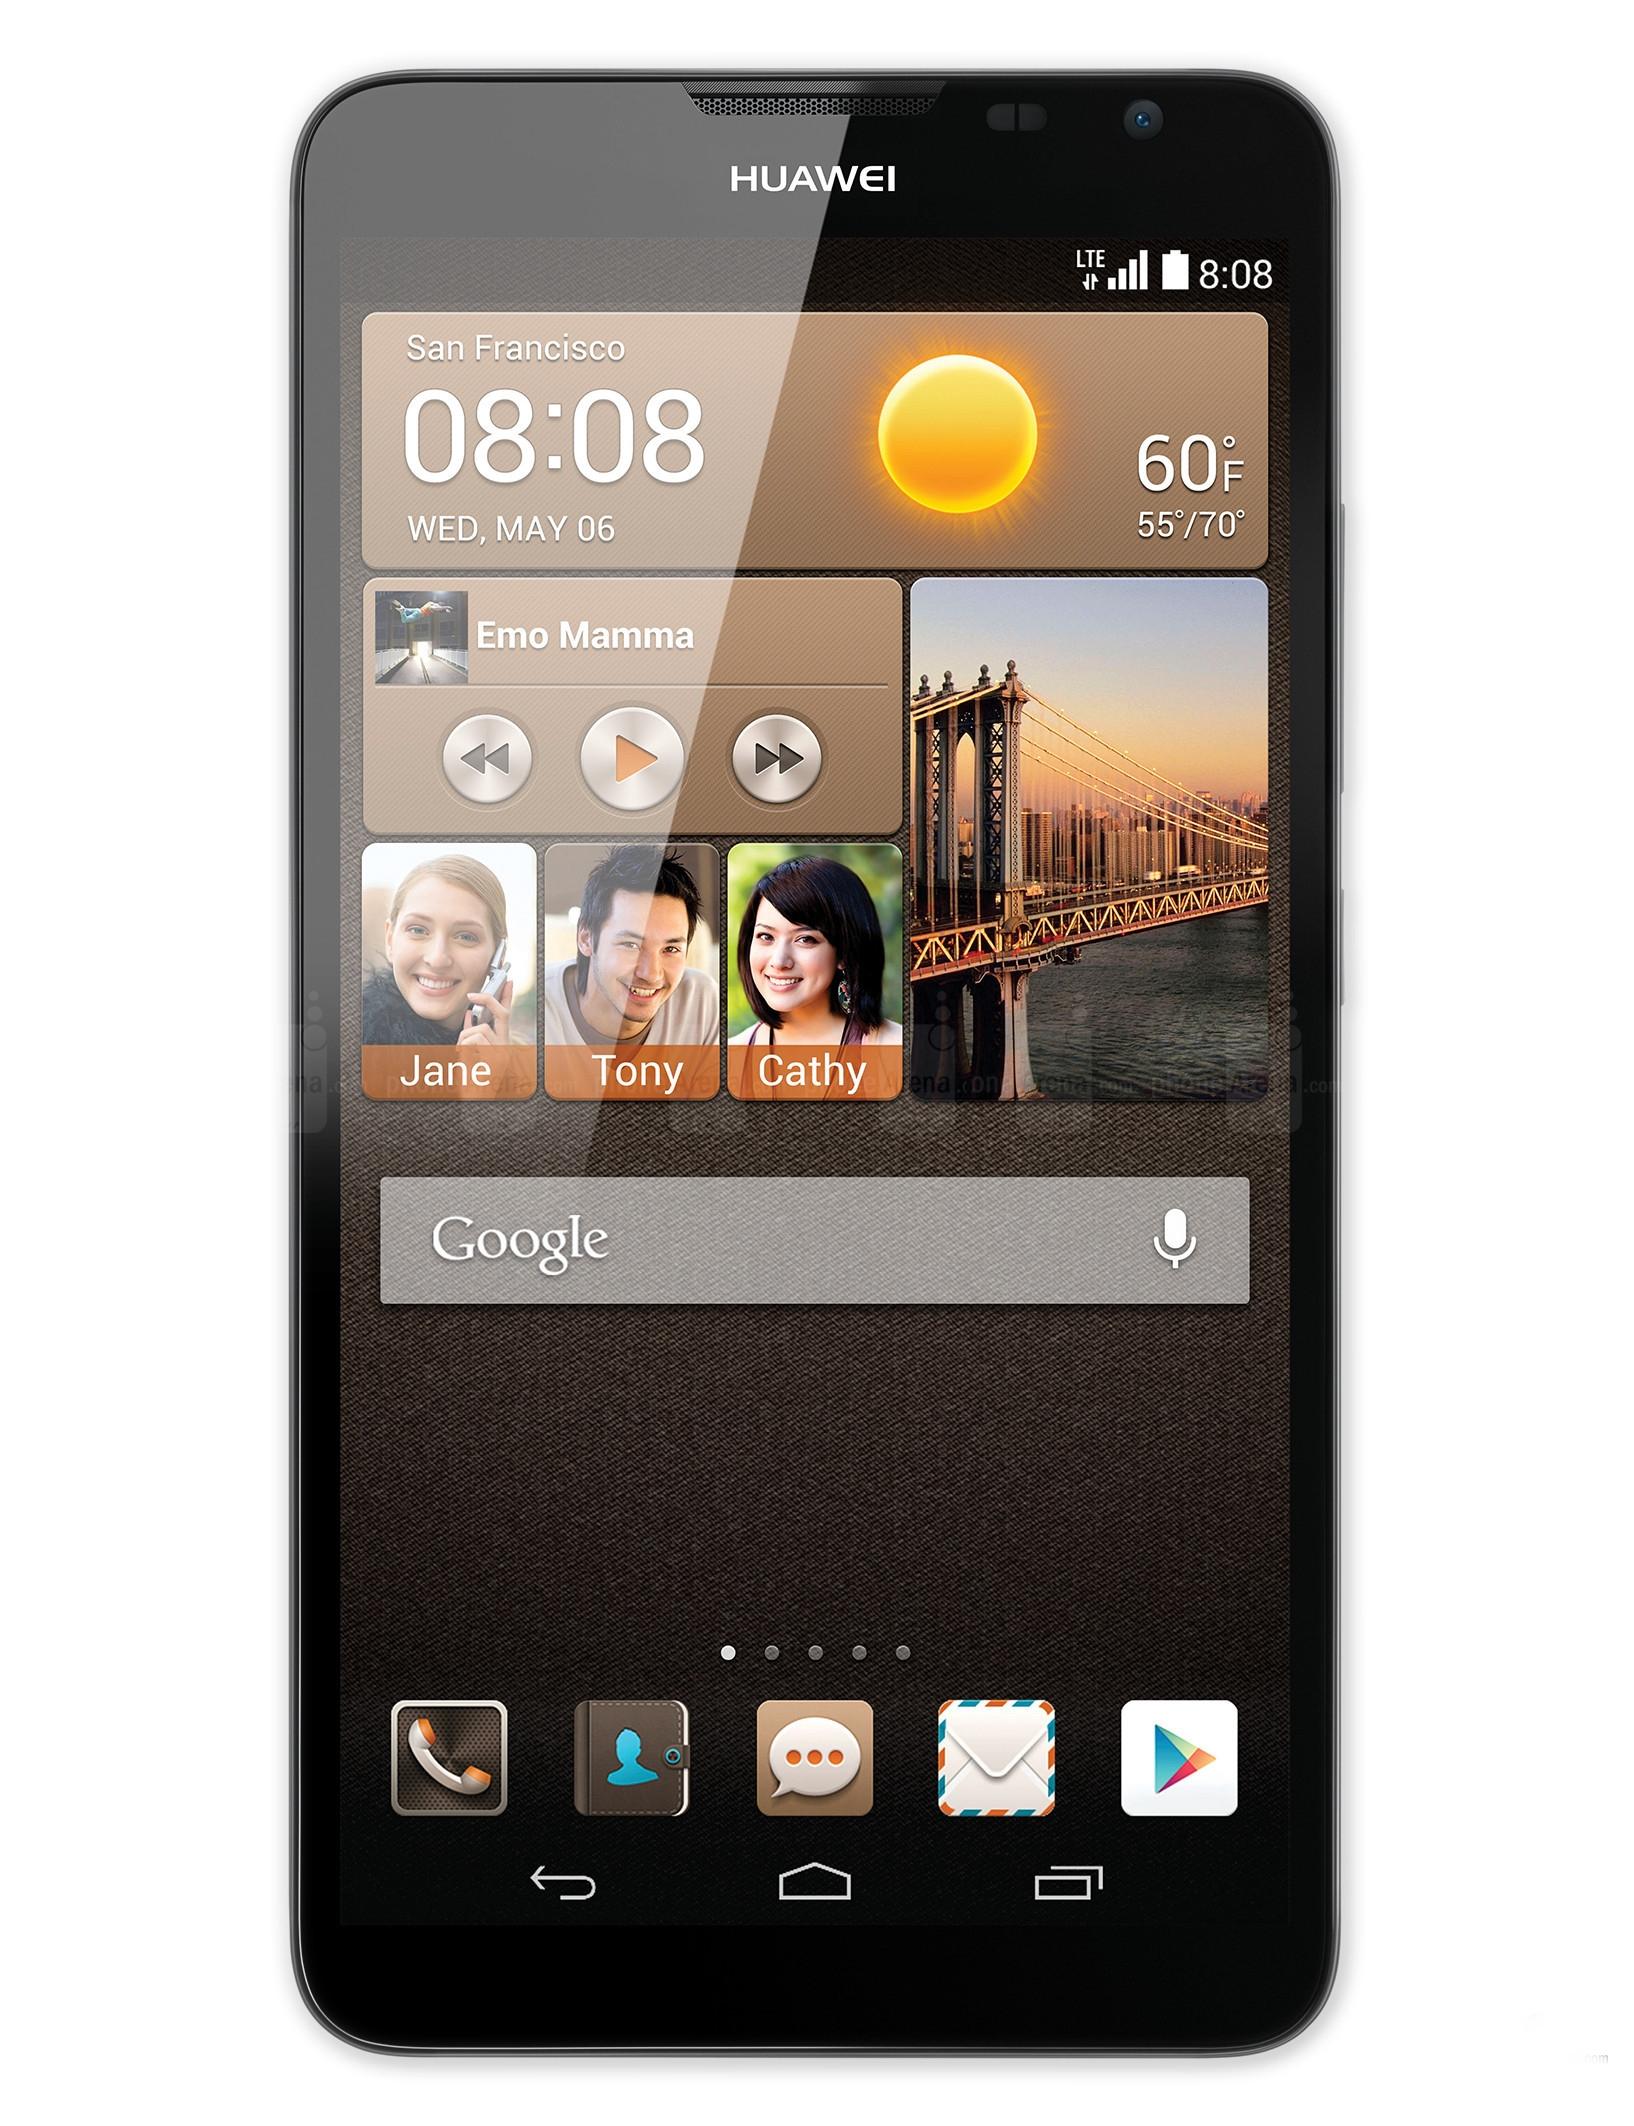 Huawei-Ascend-Mate-2-4G-0